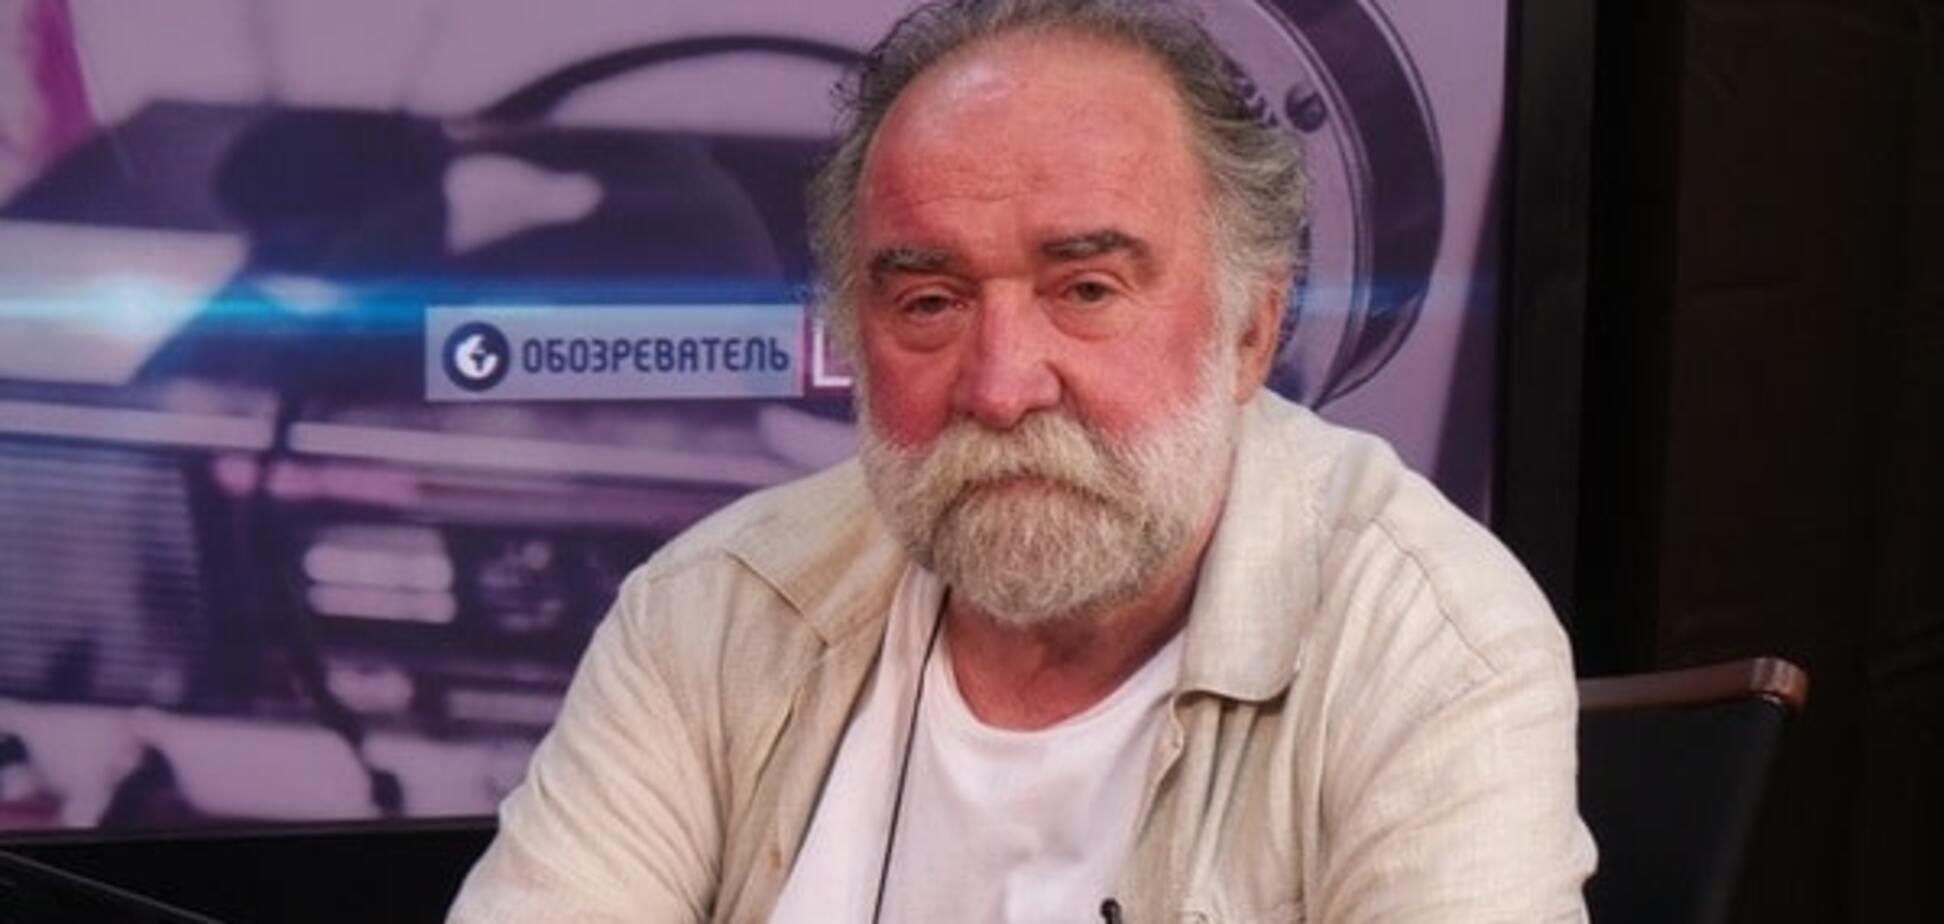 Олег Панфілов